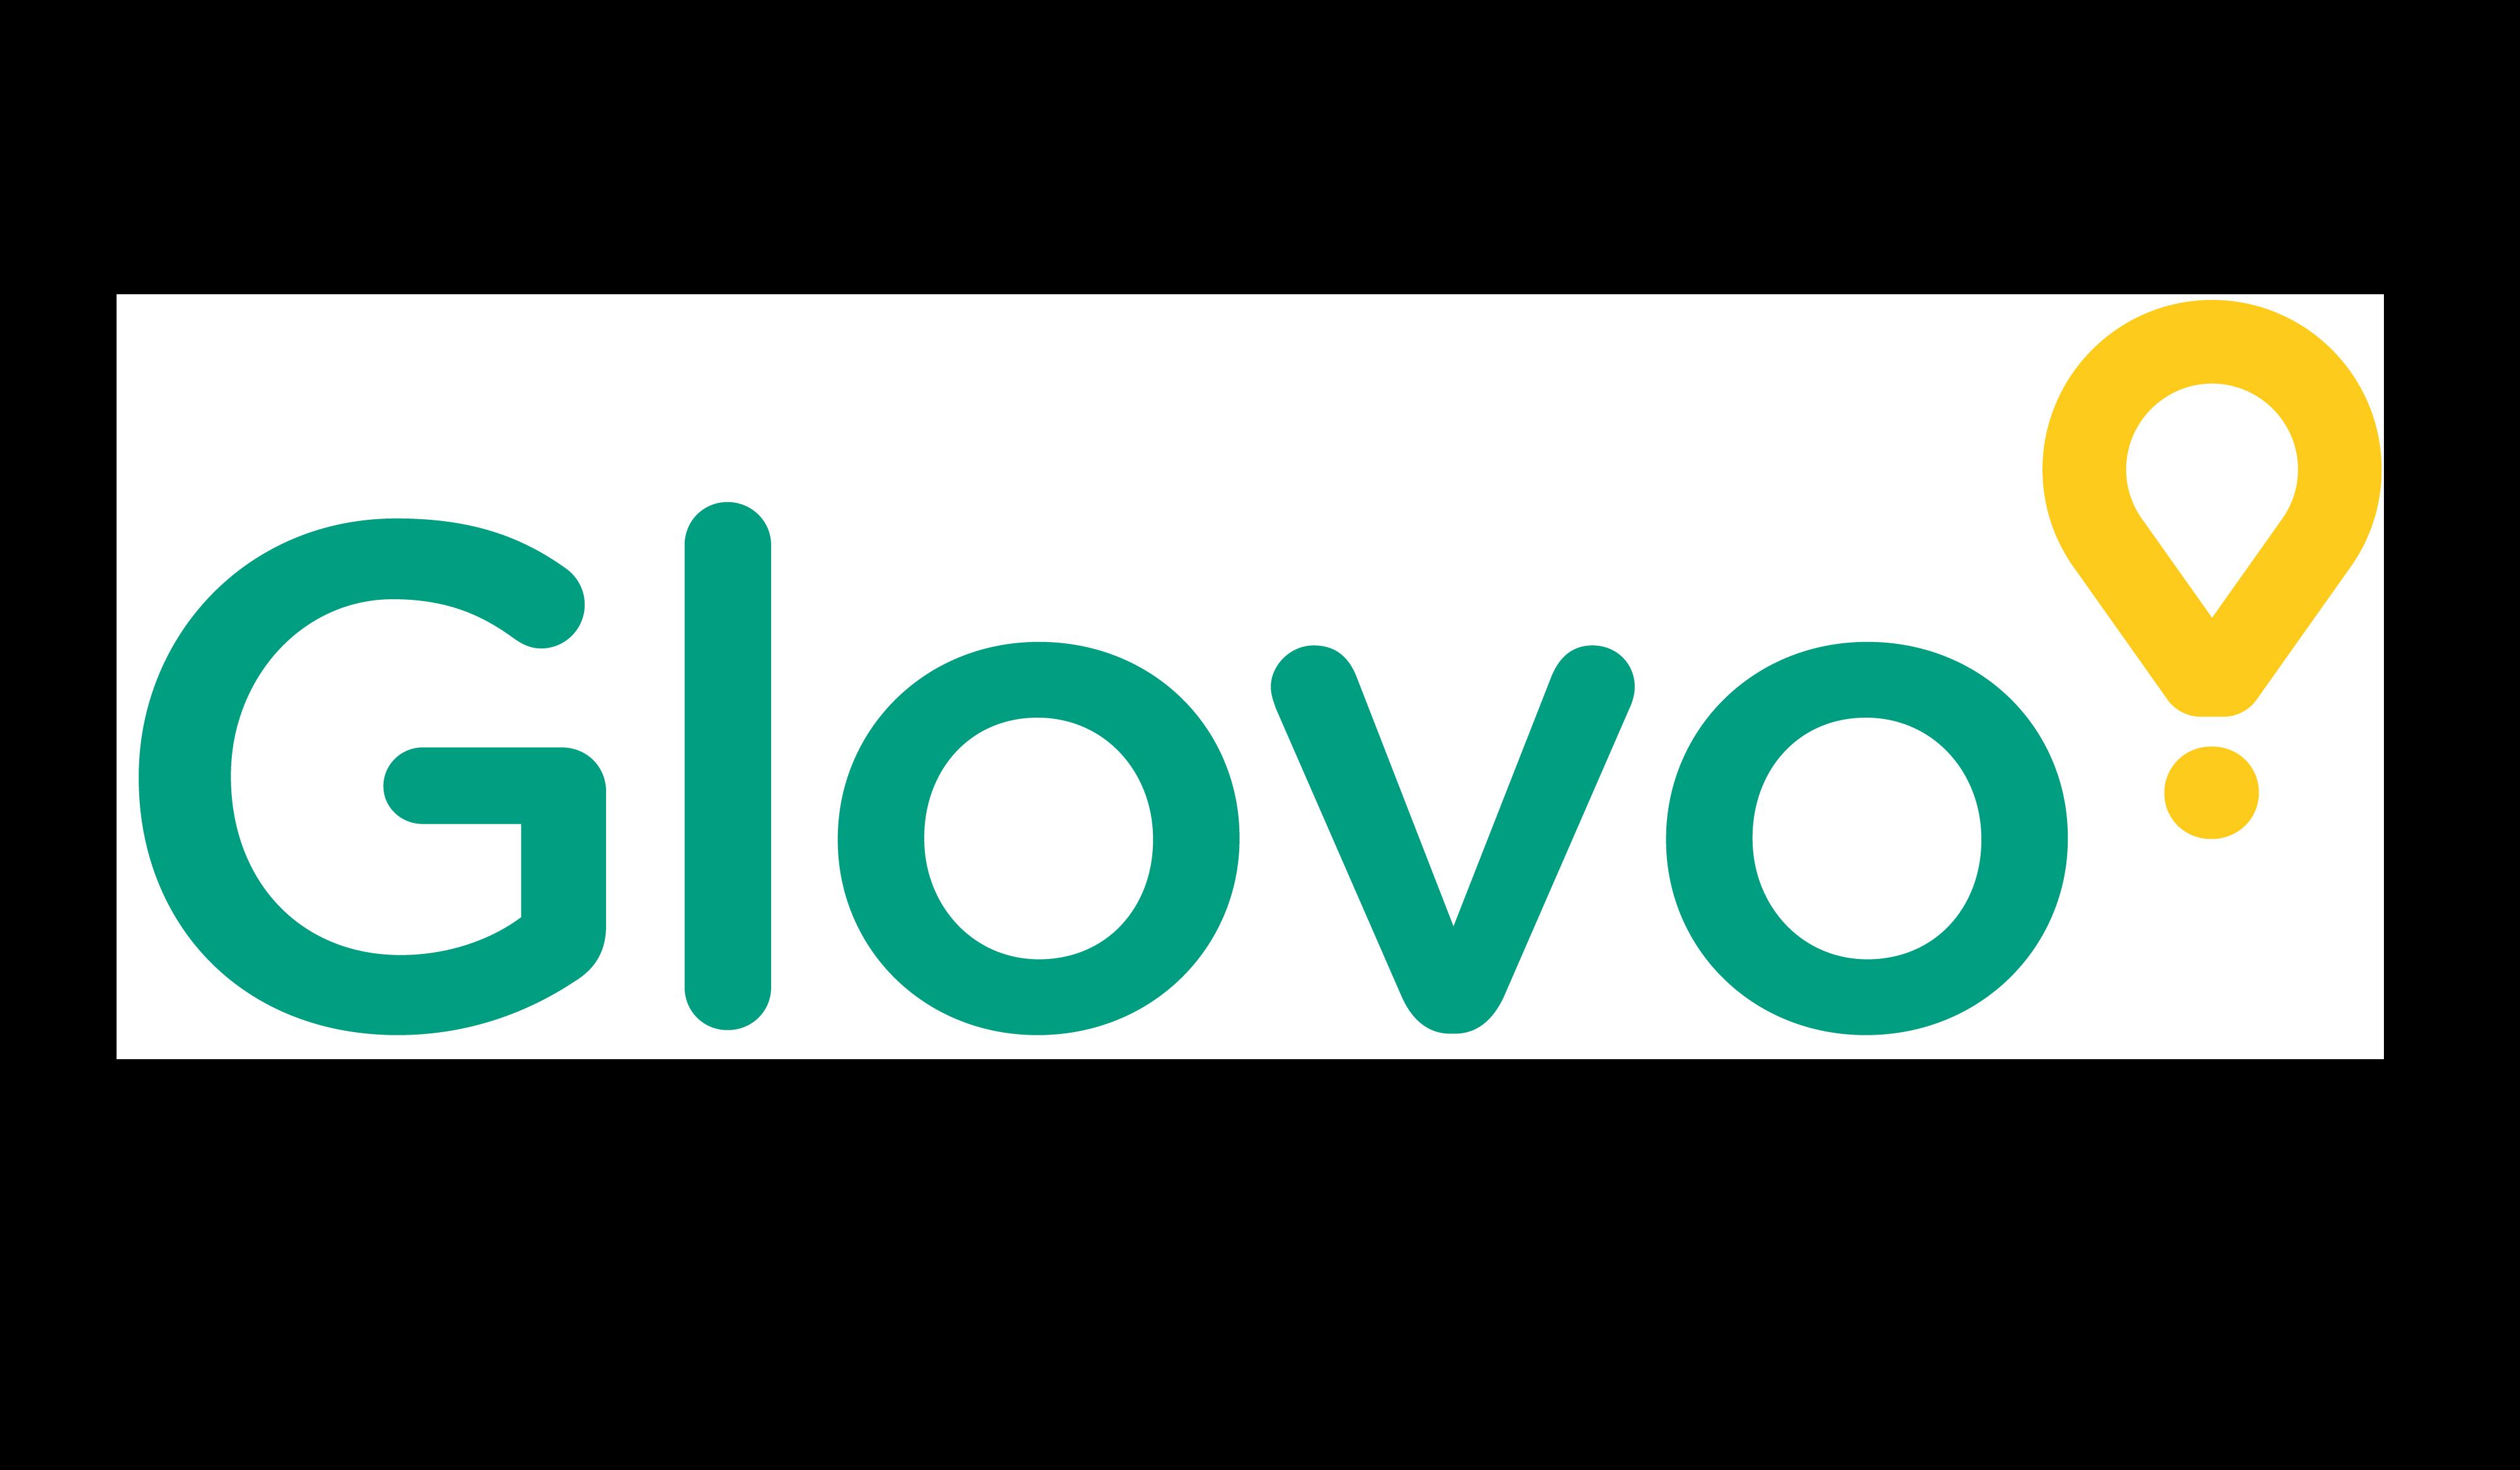 Glovo logo clipart vector freeuse download Glovo\'s new feature - Alberto De Las Heras - Medium vector freeuse download